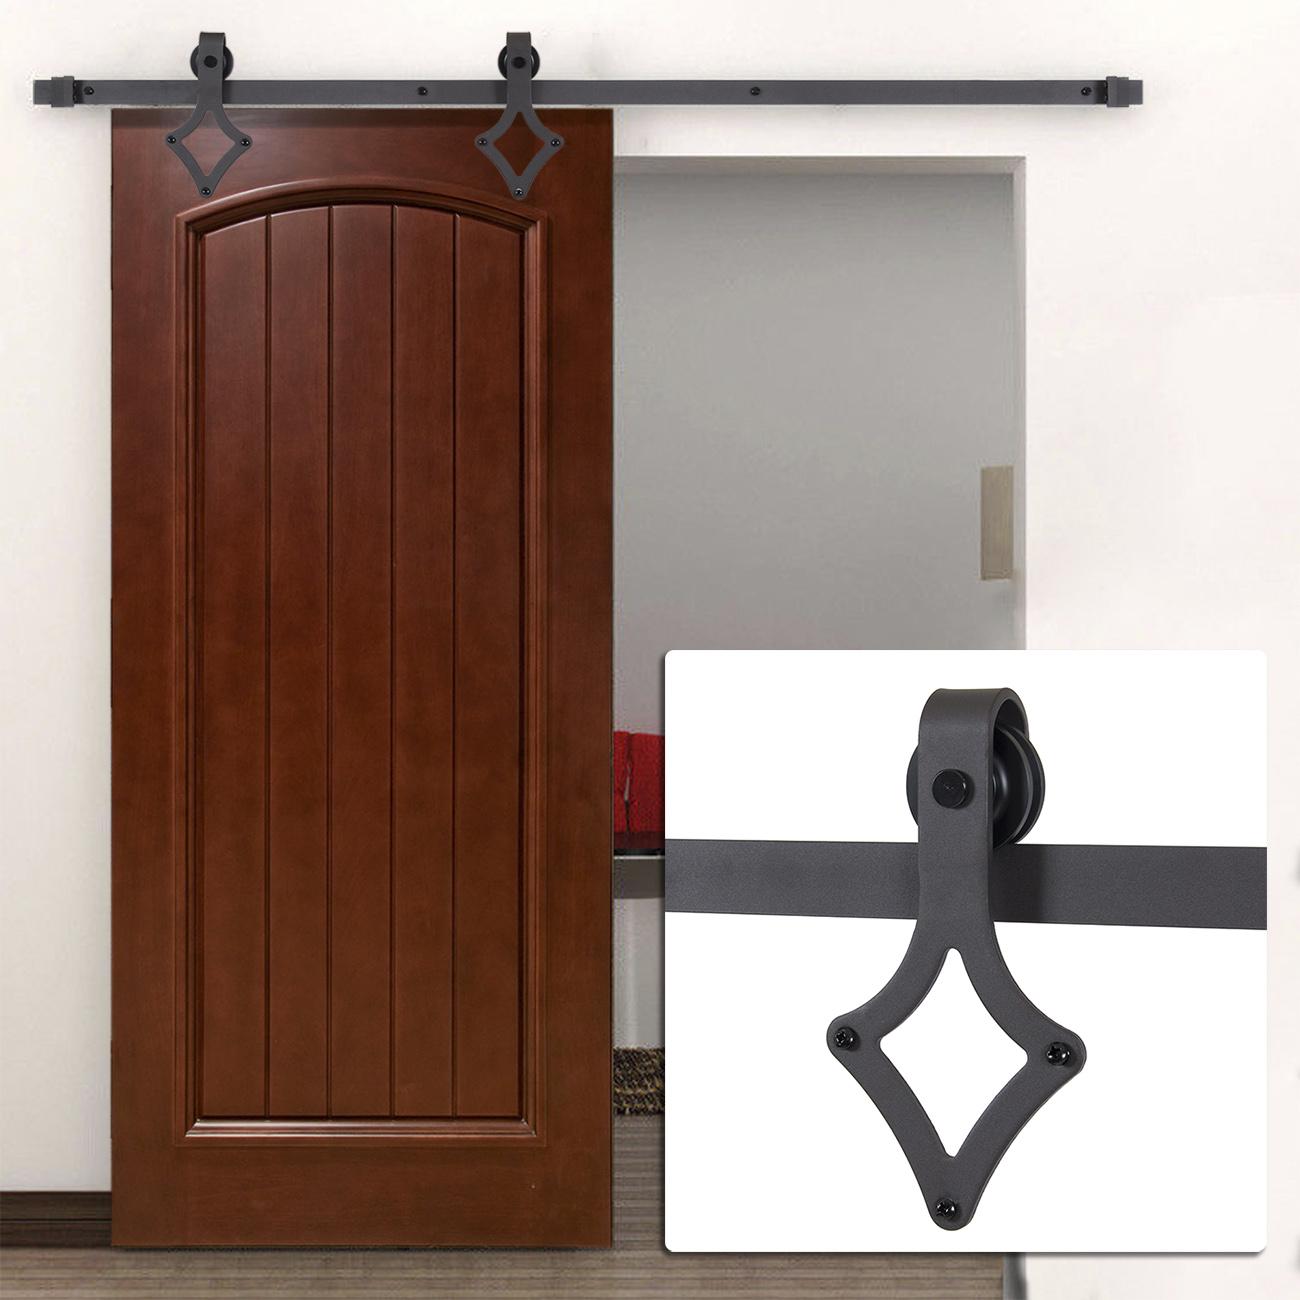 Home Decor Innovations Closet Doors Carbon Steel Interior Sliding Barn Wood Entry Door